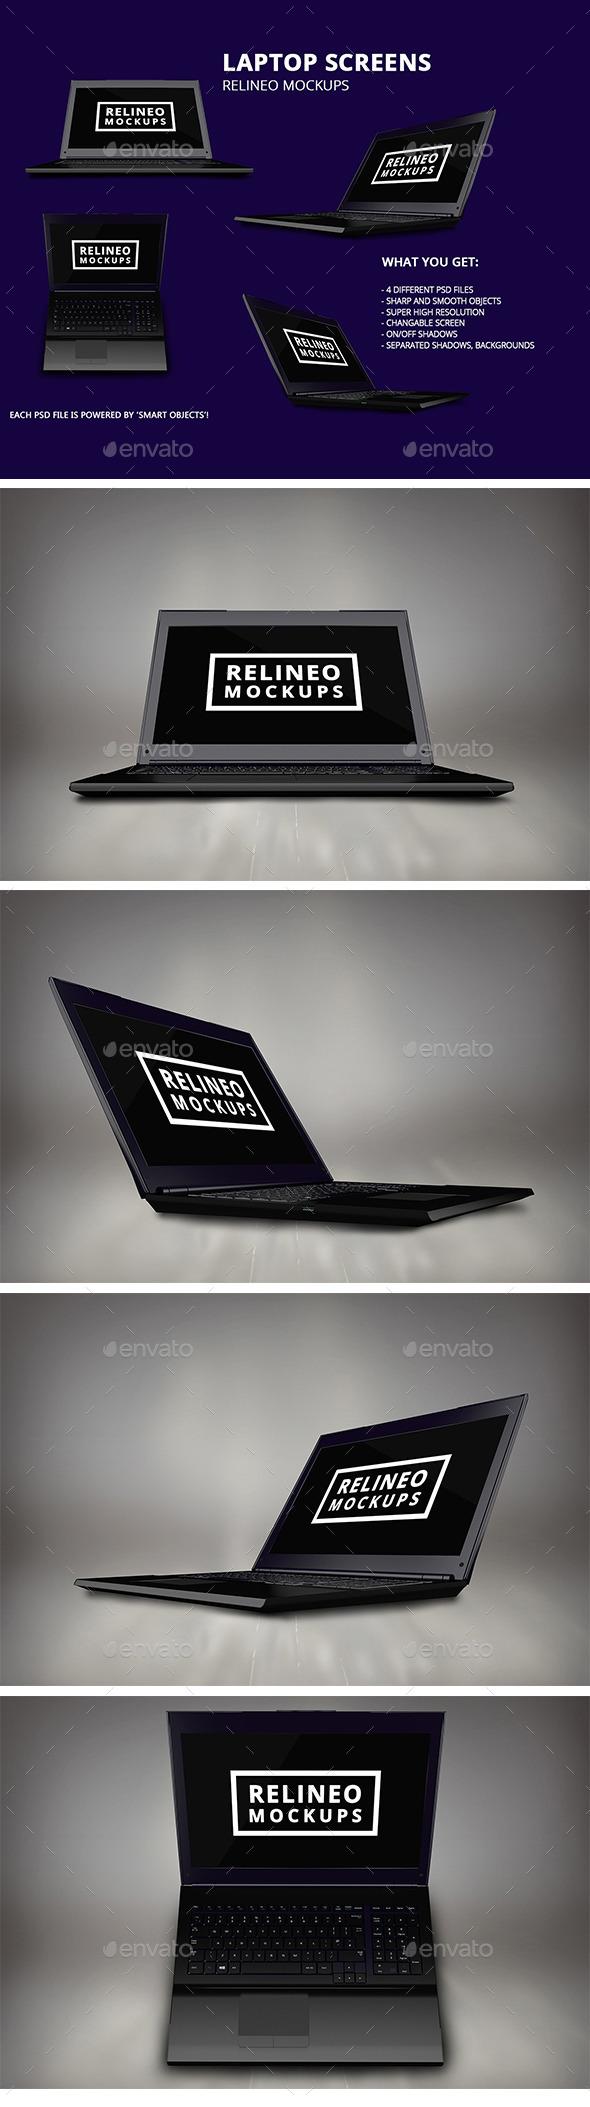 Windows Laptop Display Mock-up Pack Vol.1 - Laptop Displays